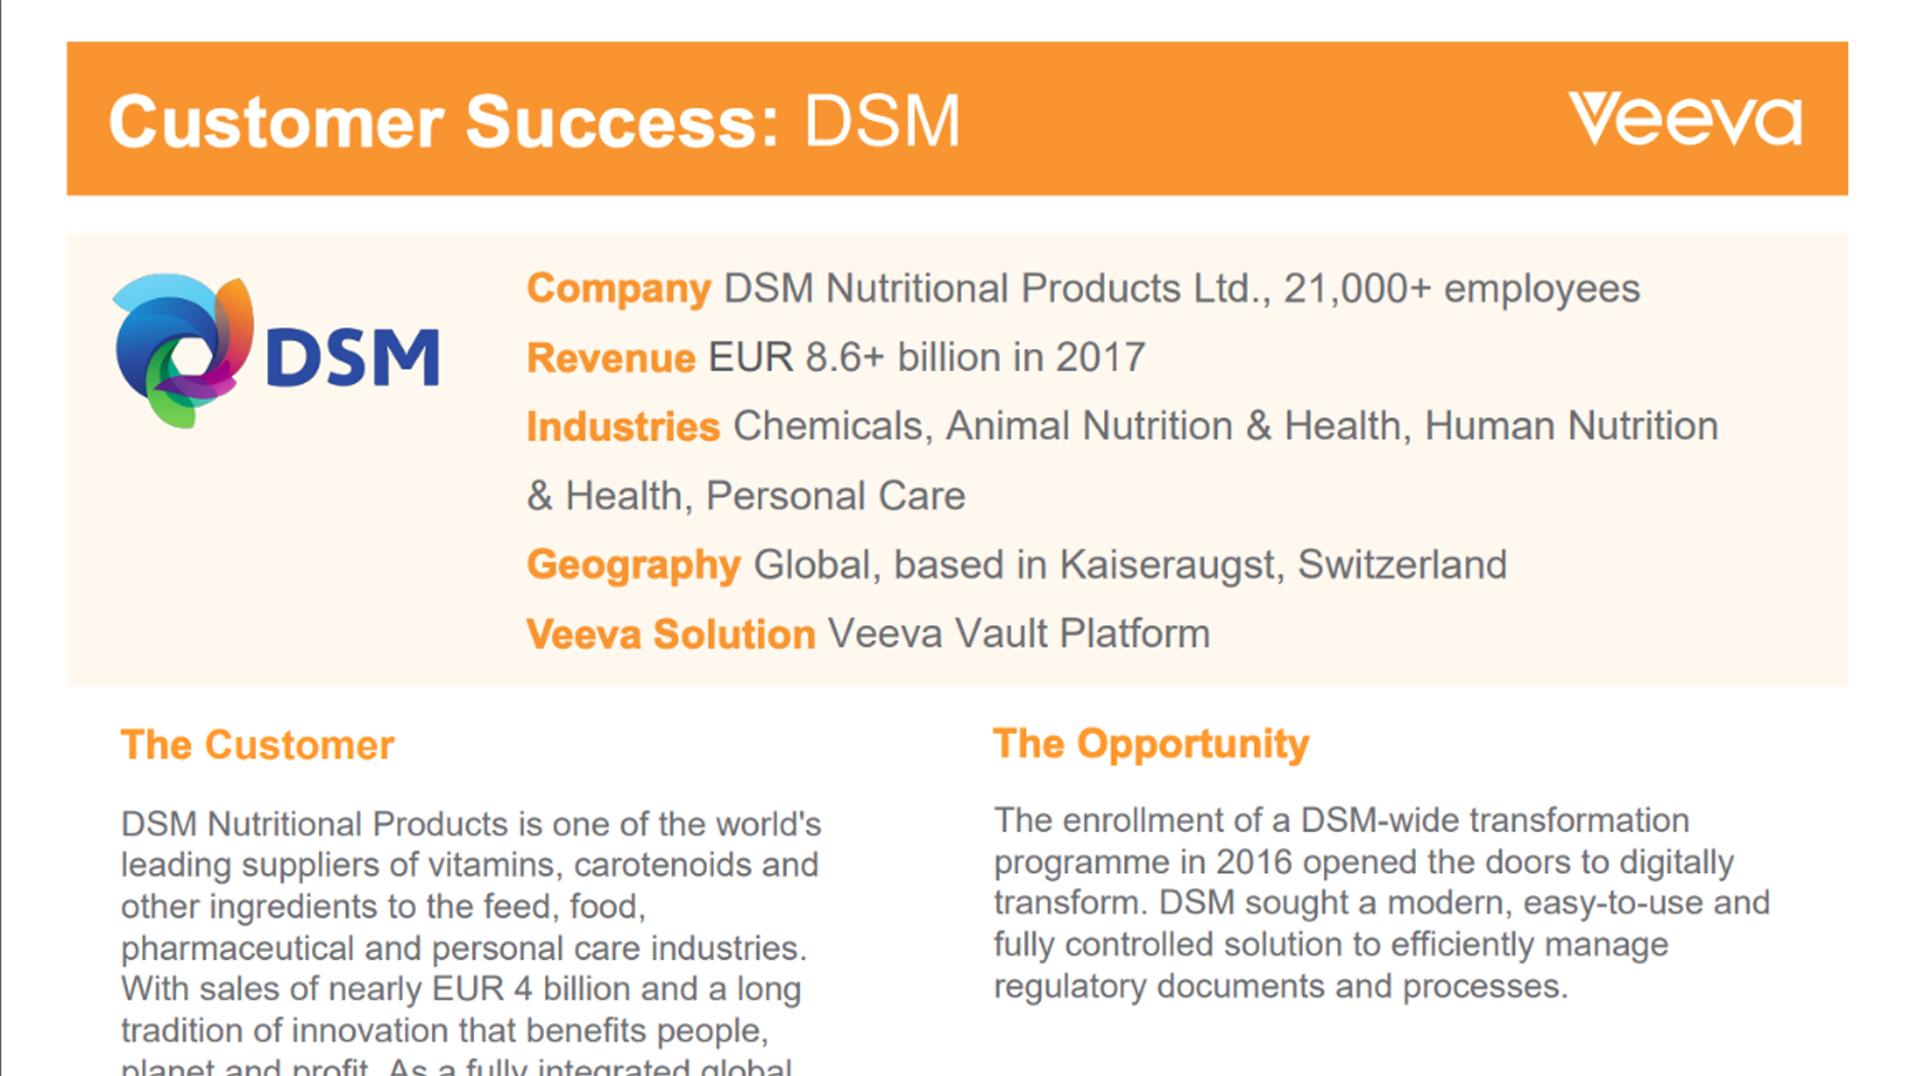 Customer Success DSM